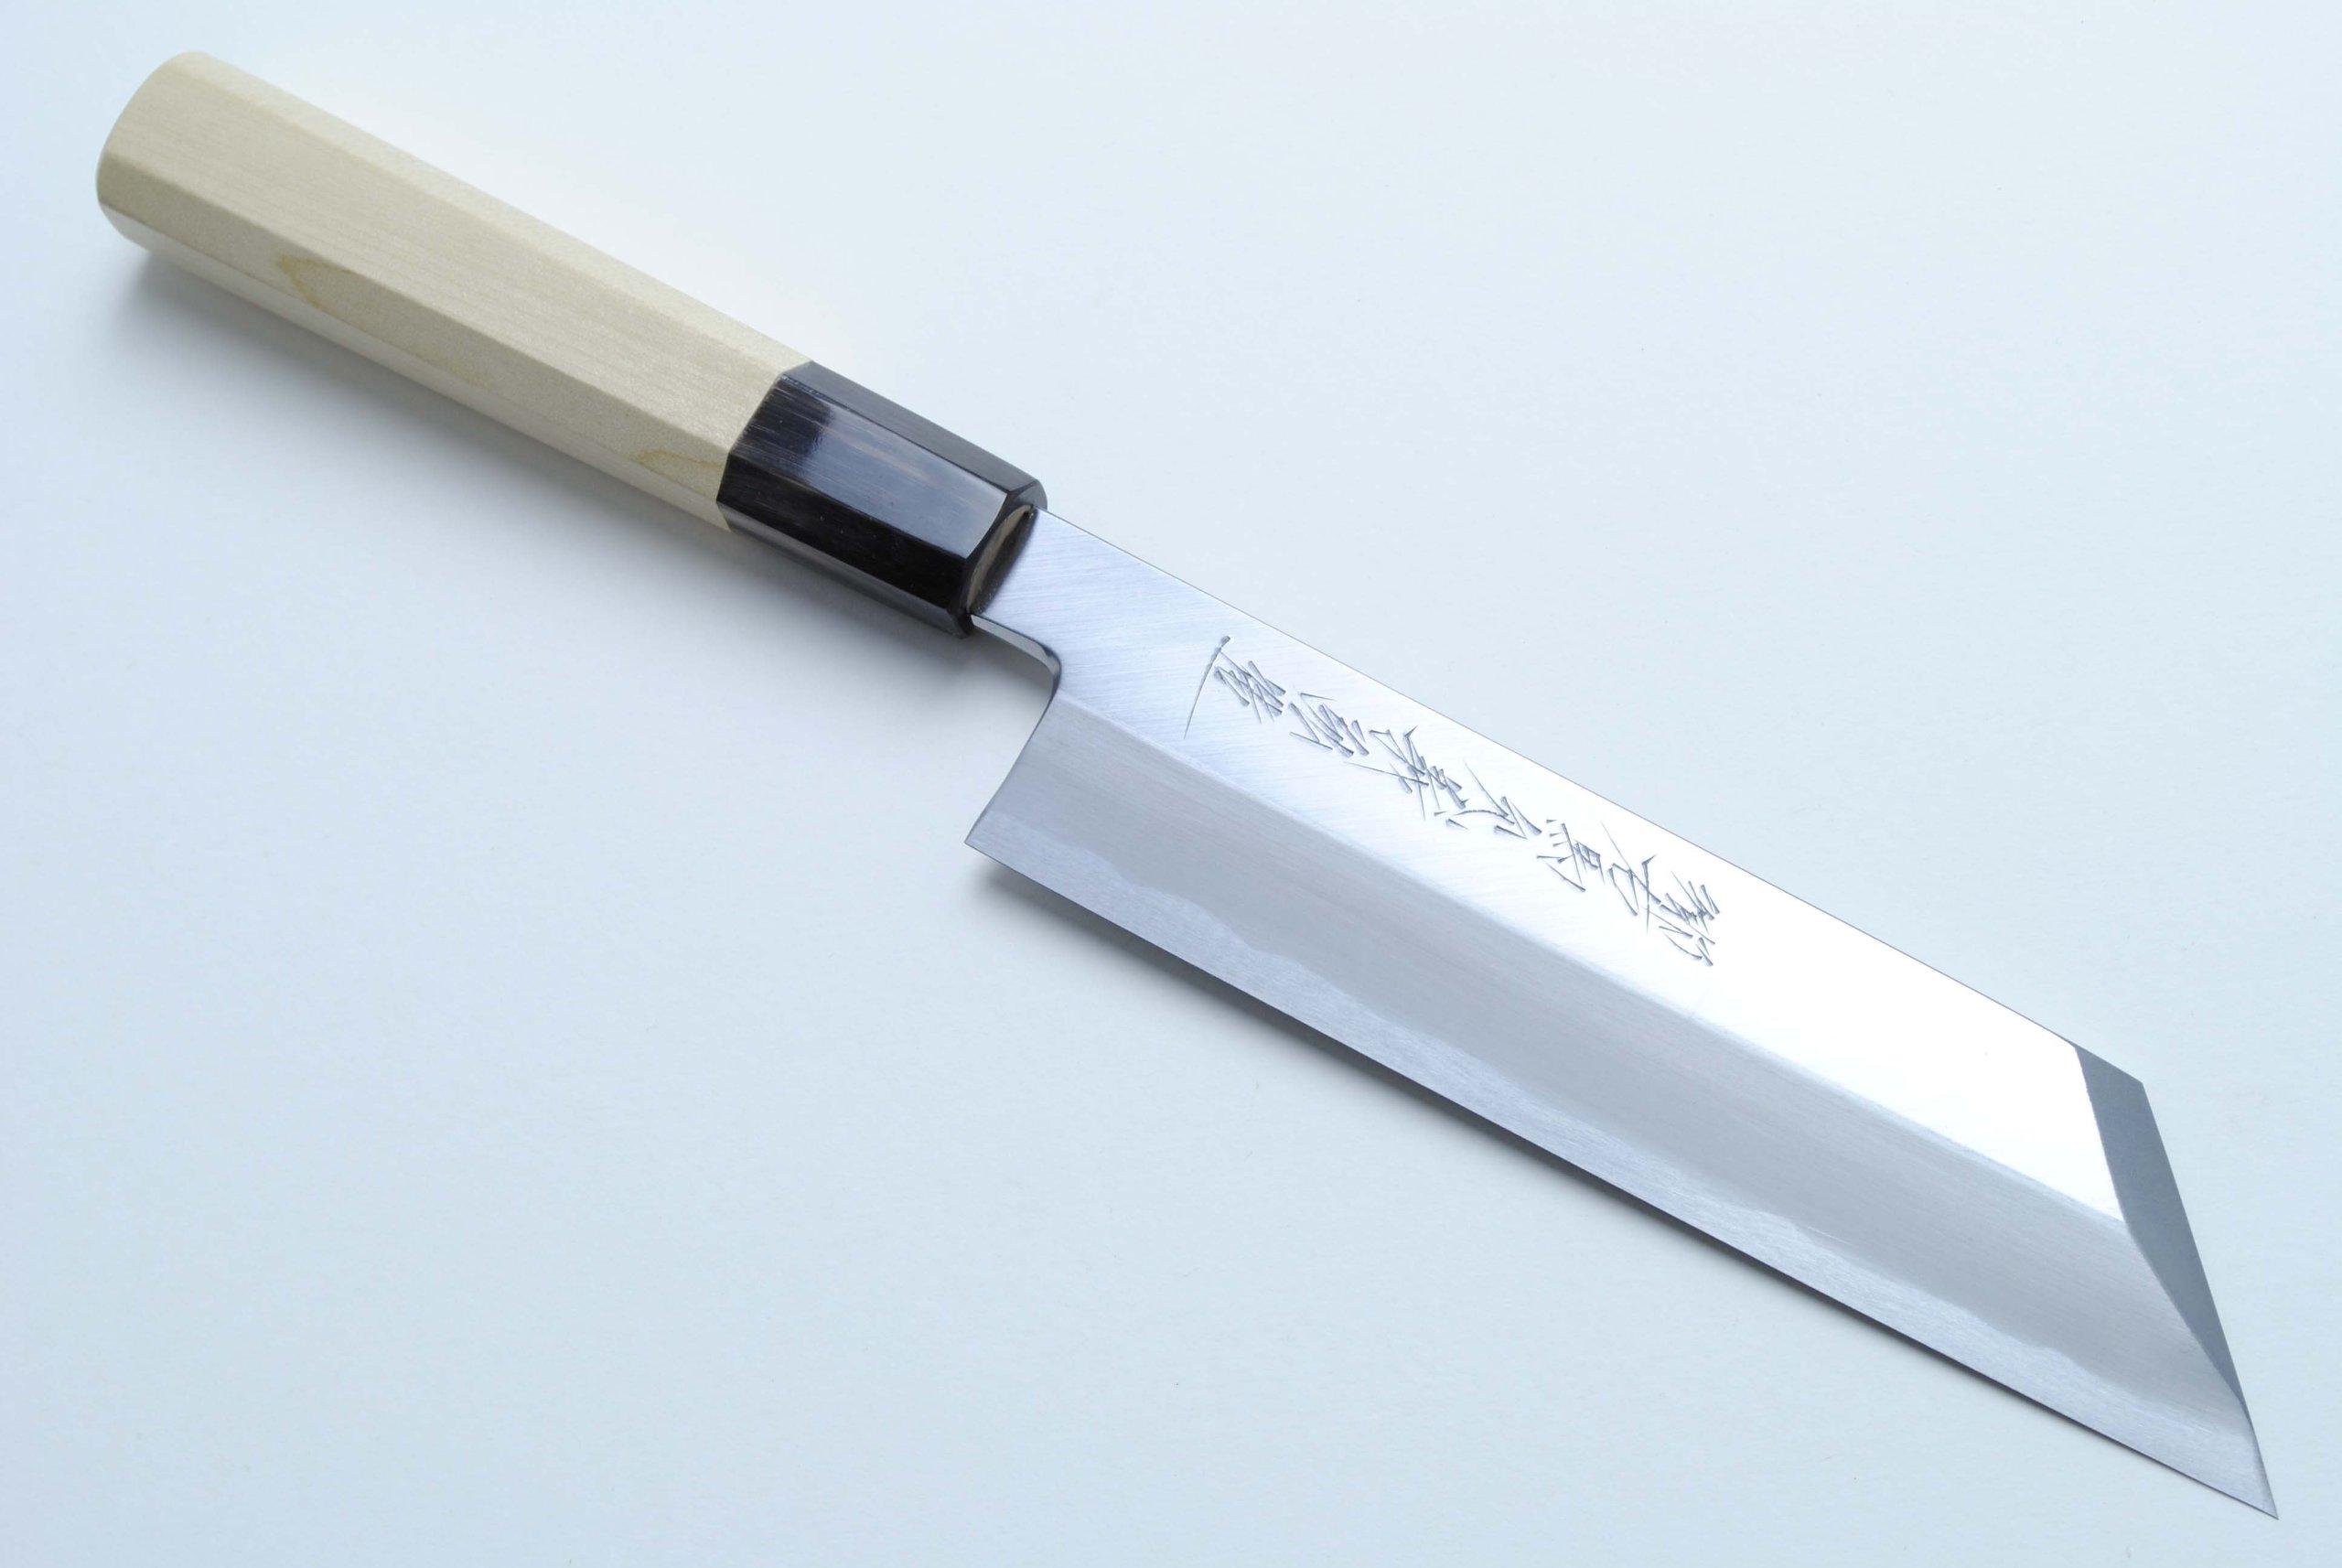 Yoshihiro Aoko Blue High Carbon Steel Hongasumi Kenmuki Japanese Vegetable Utility Chef Knife 7 Inch(180mm)